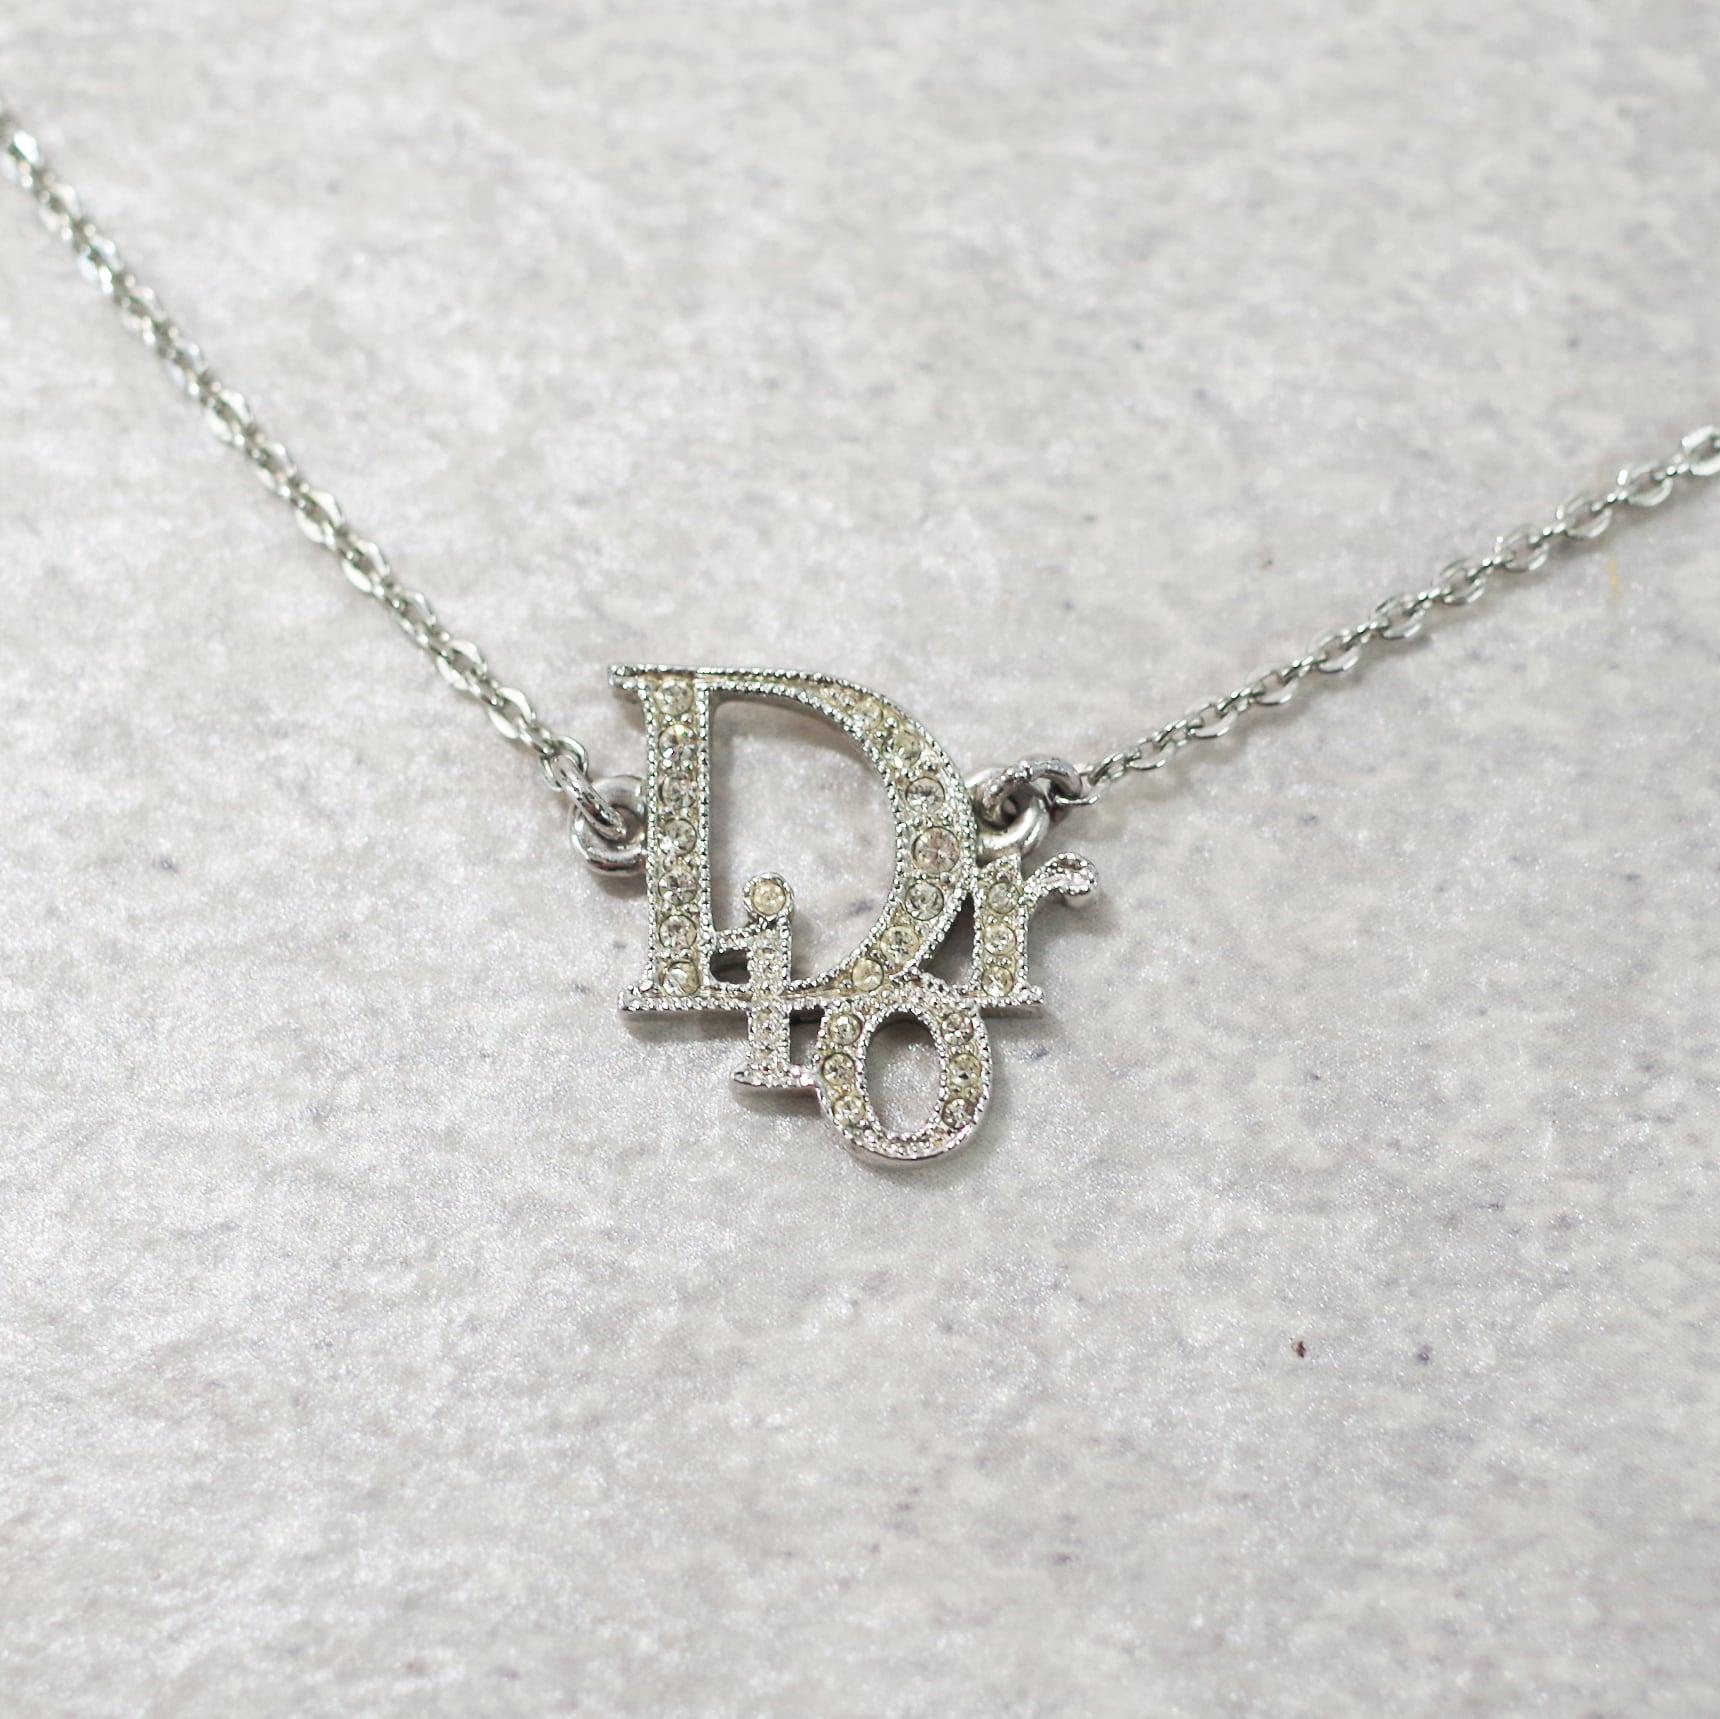 Christian Dior ディオール ネックレス シルバー アクセサリー